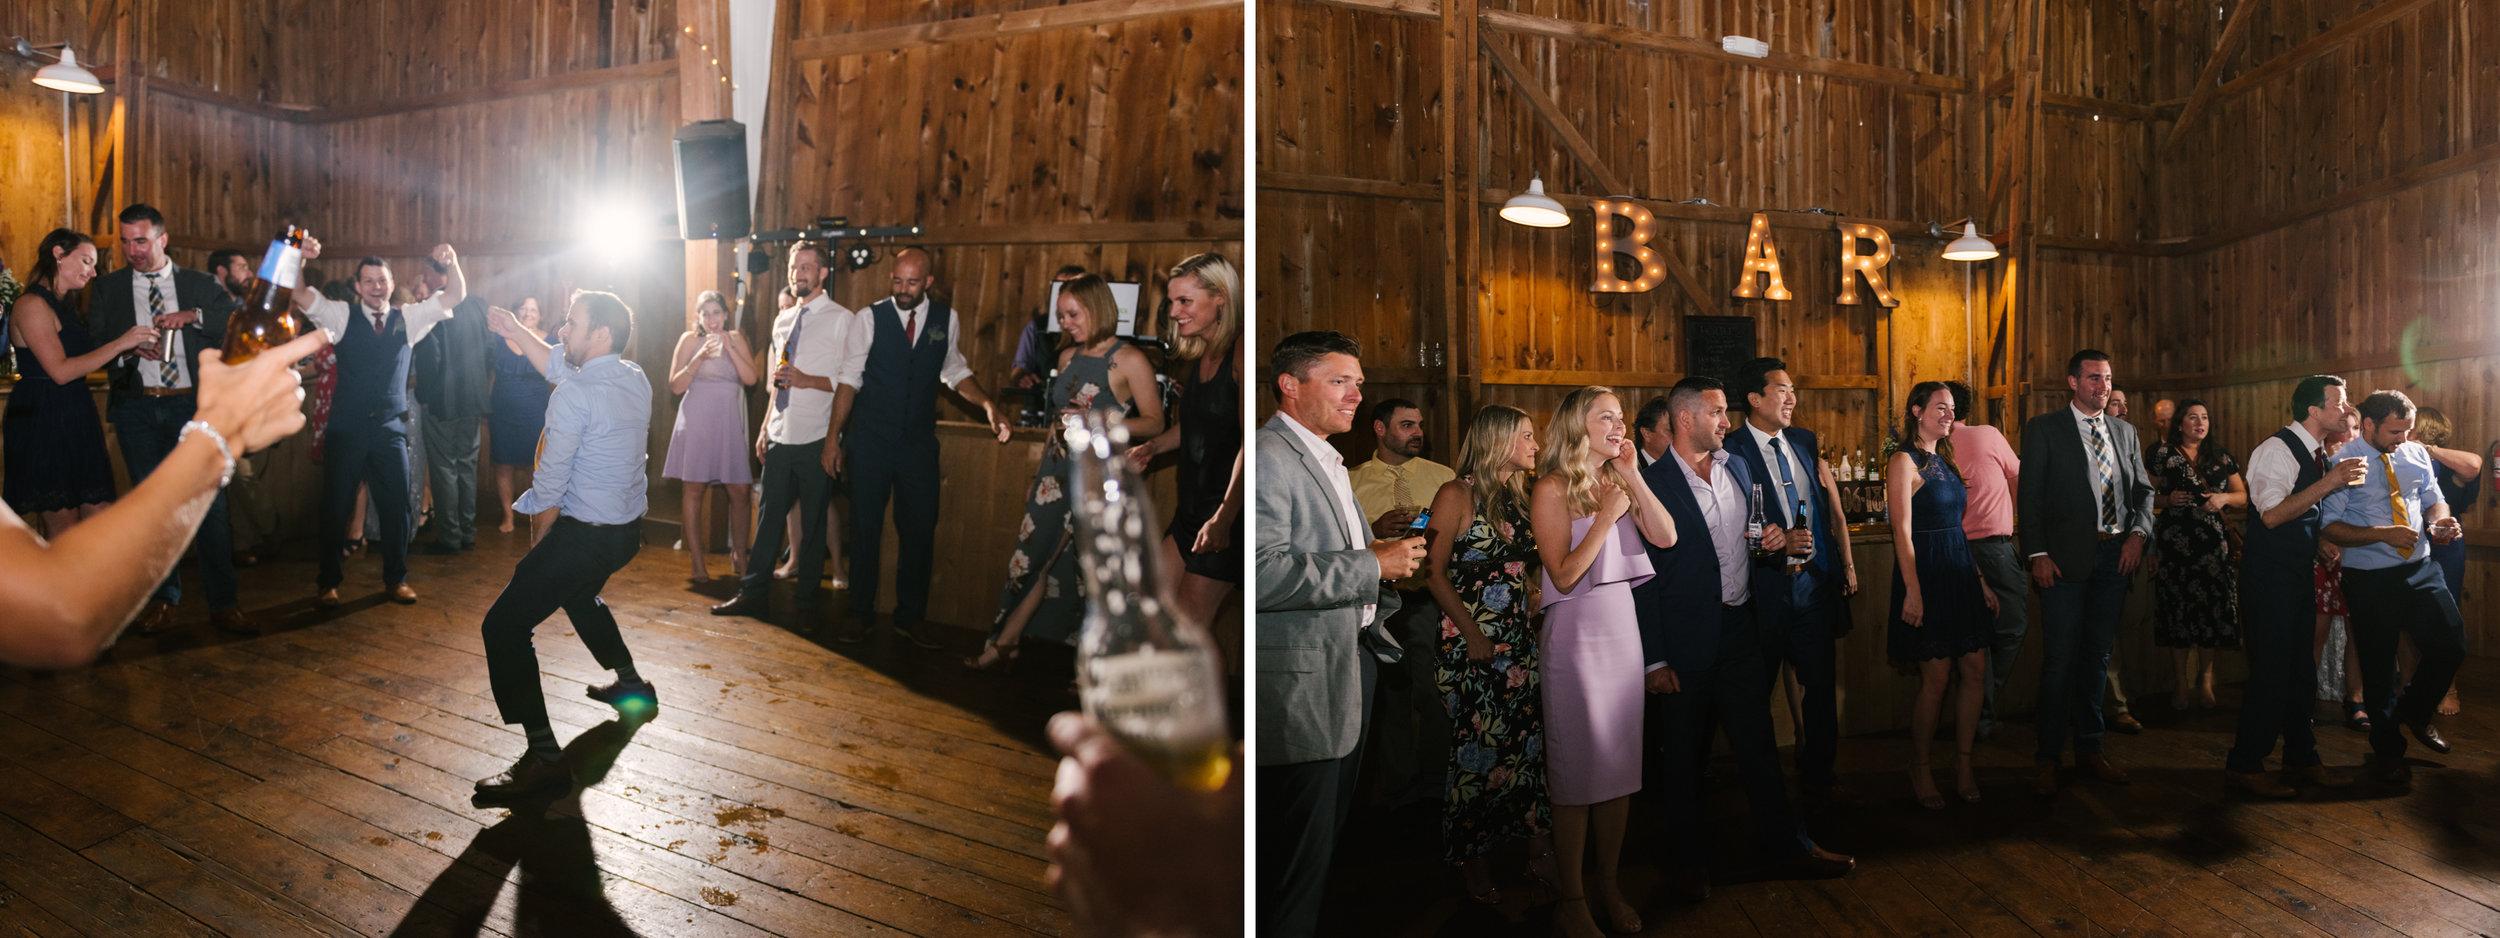 cobblestone-wedding-barn-rochester-photography-44.jpg